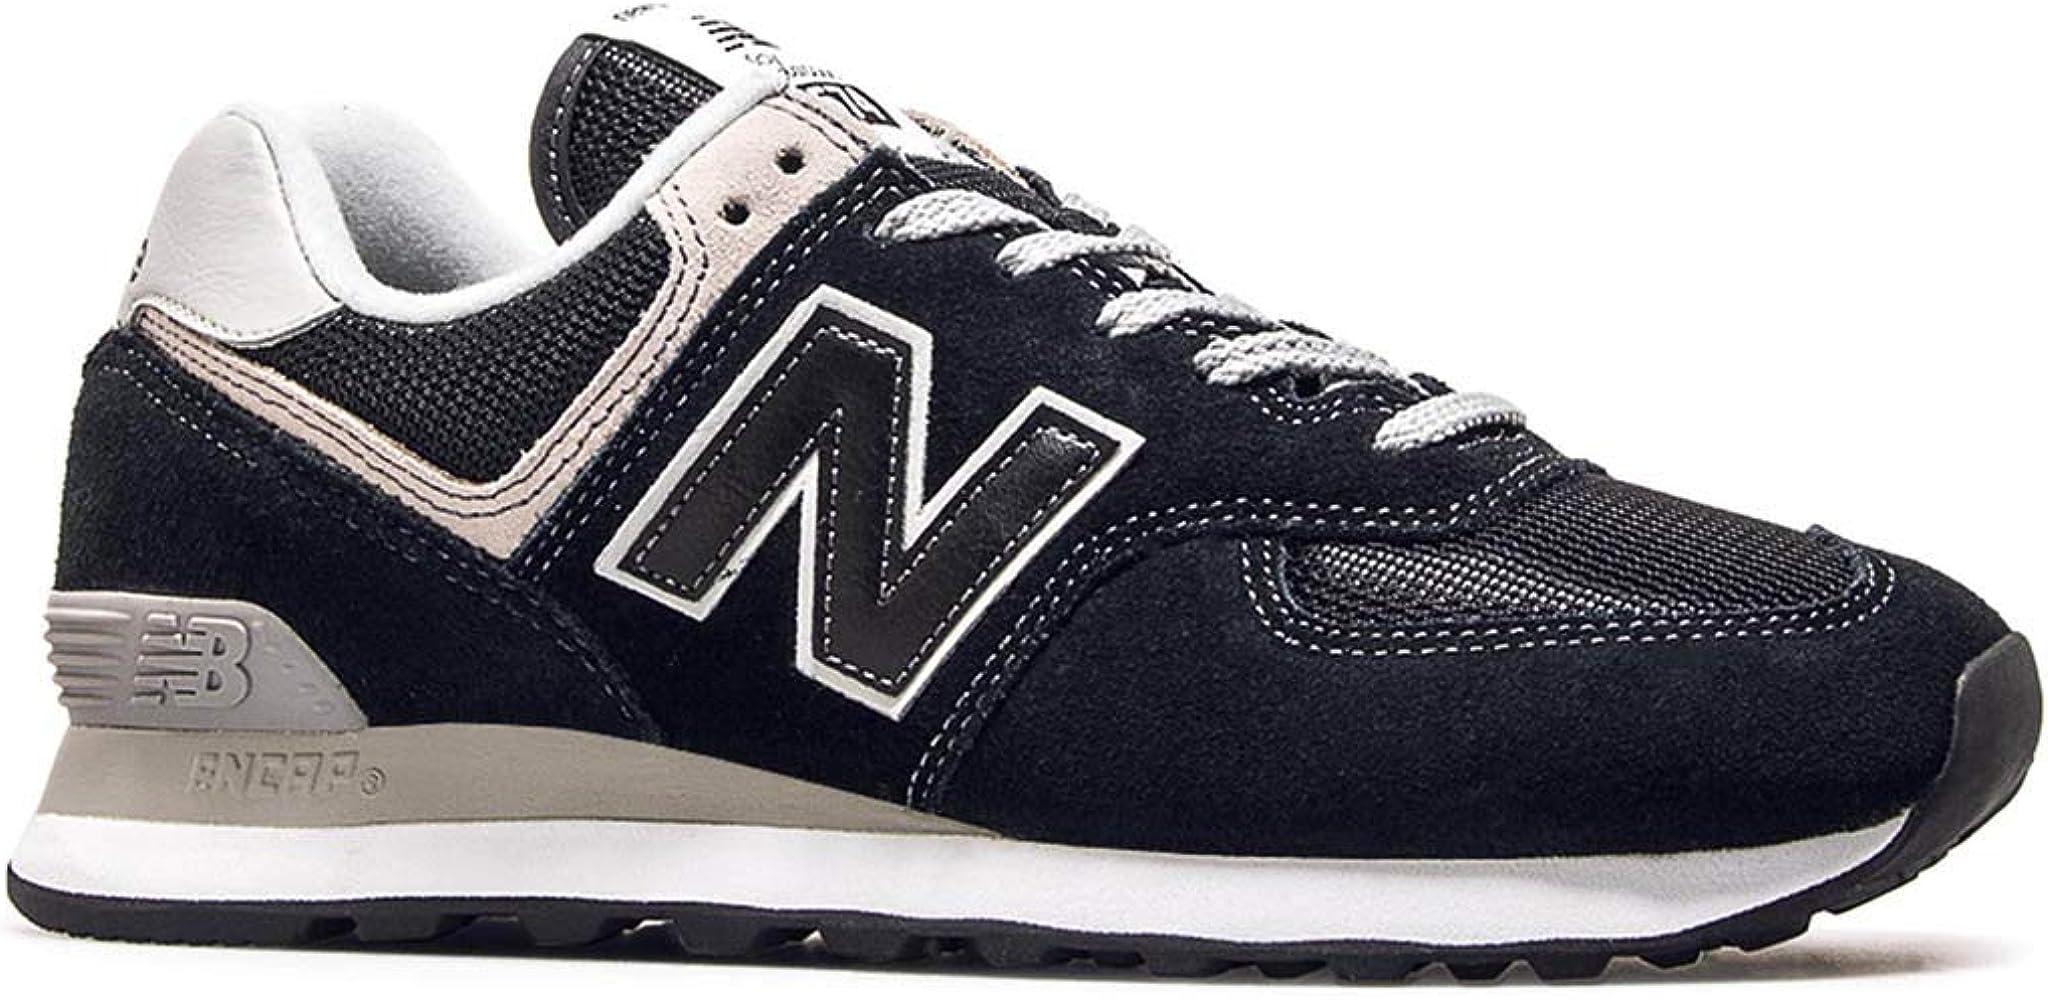 976473606f New Balance Herren Ml574egk Sneaker: Amazon.de: Schuhe & Handtaschen